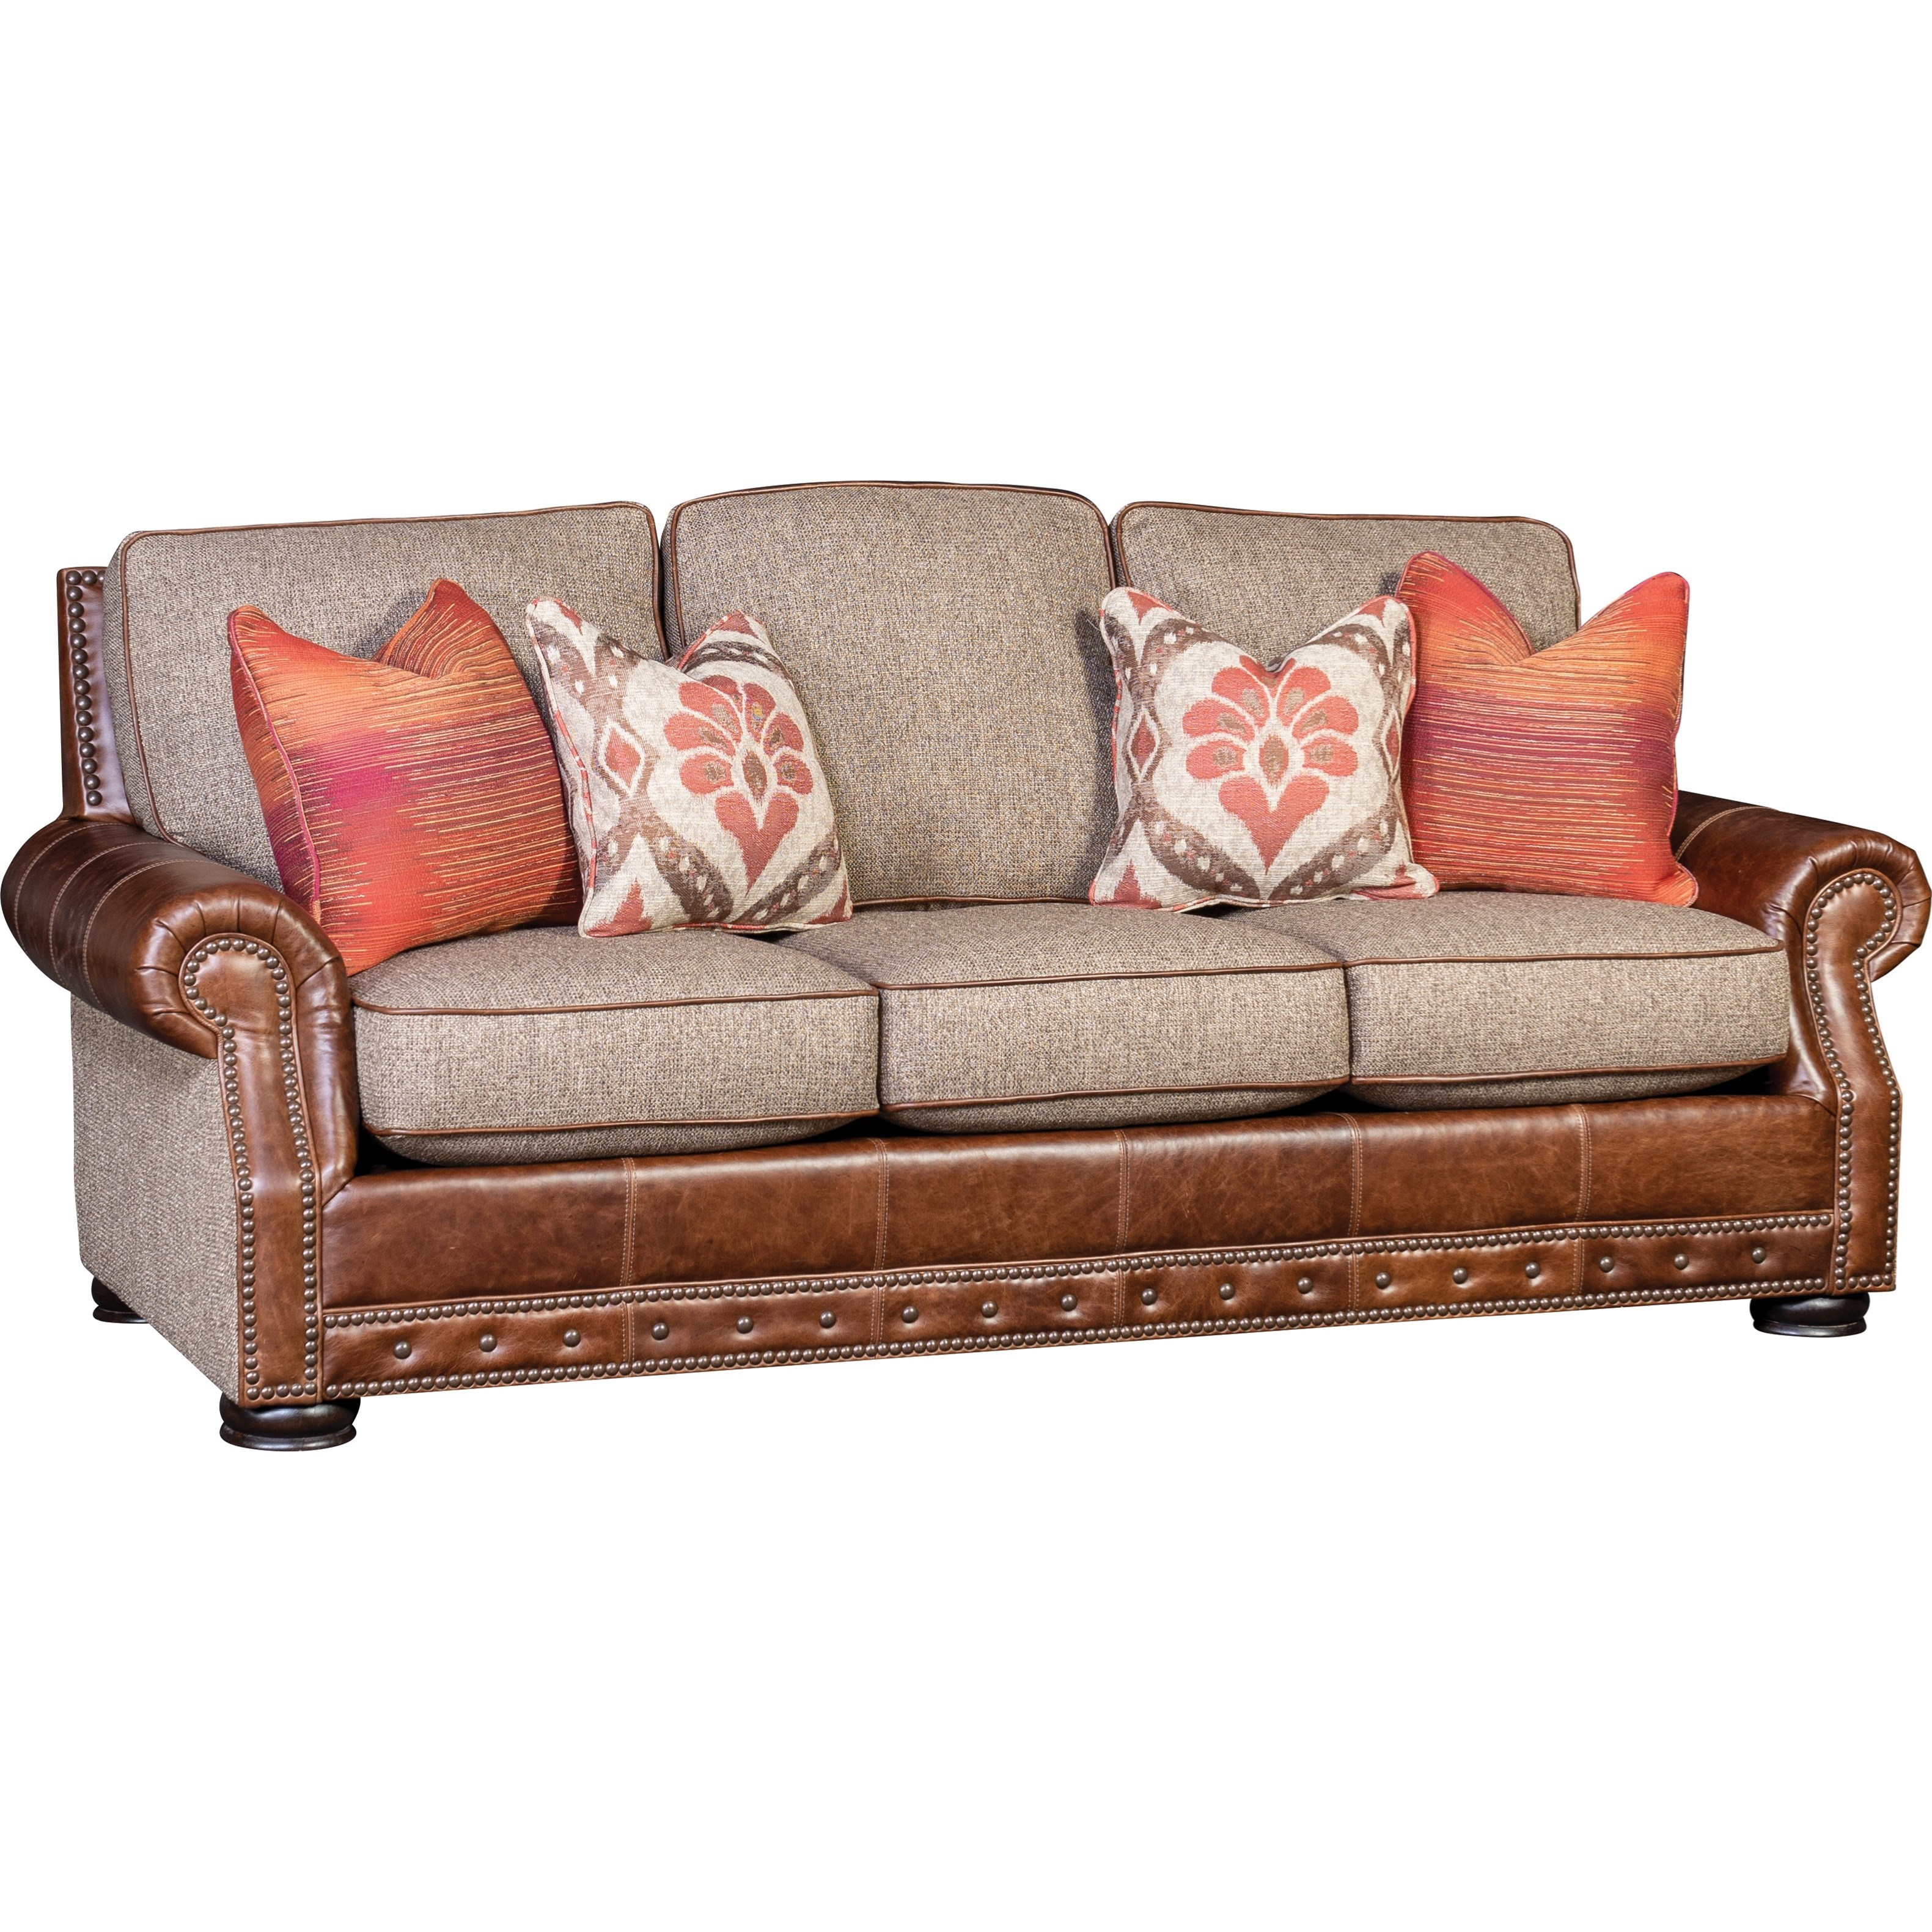 2900 Sofa by Mayo at Wilson's Furniture